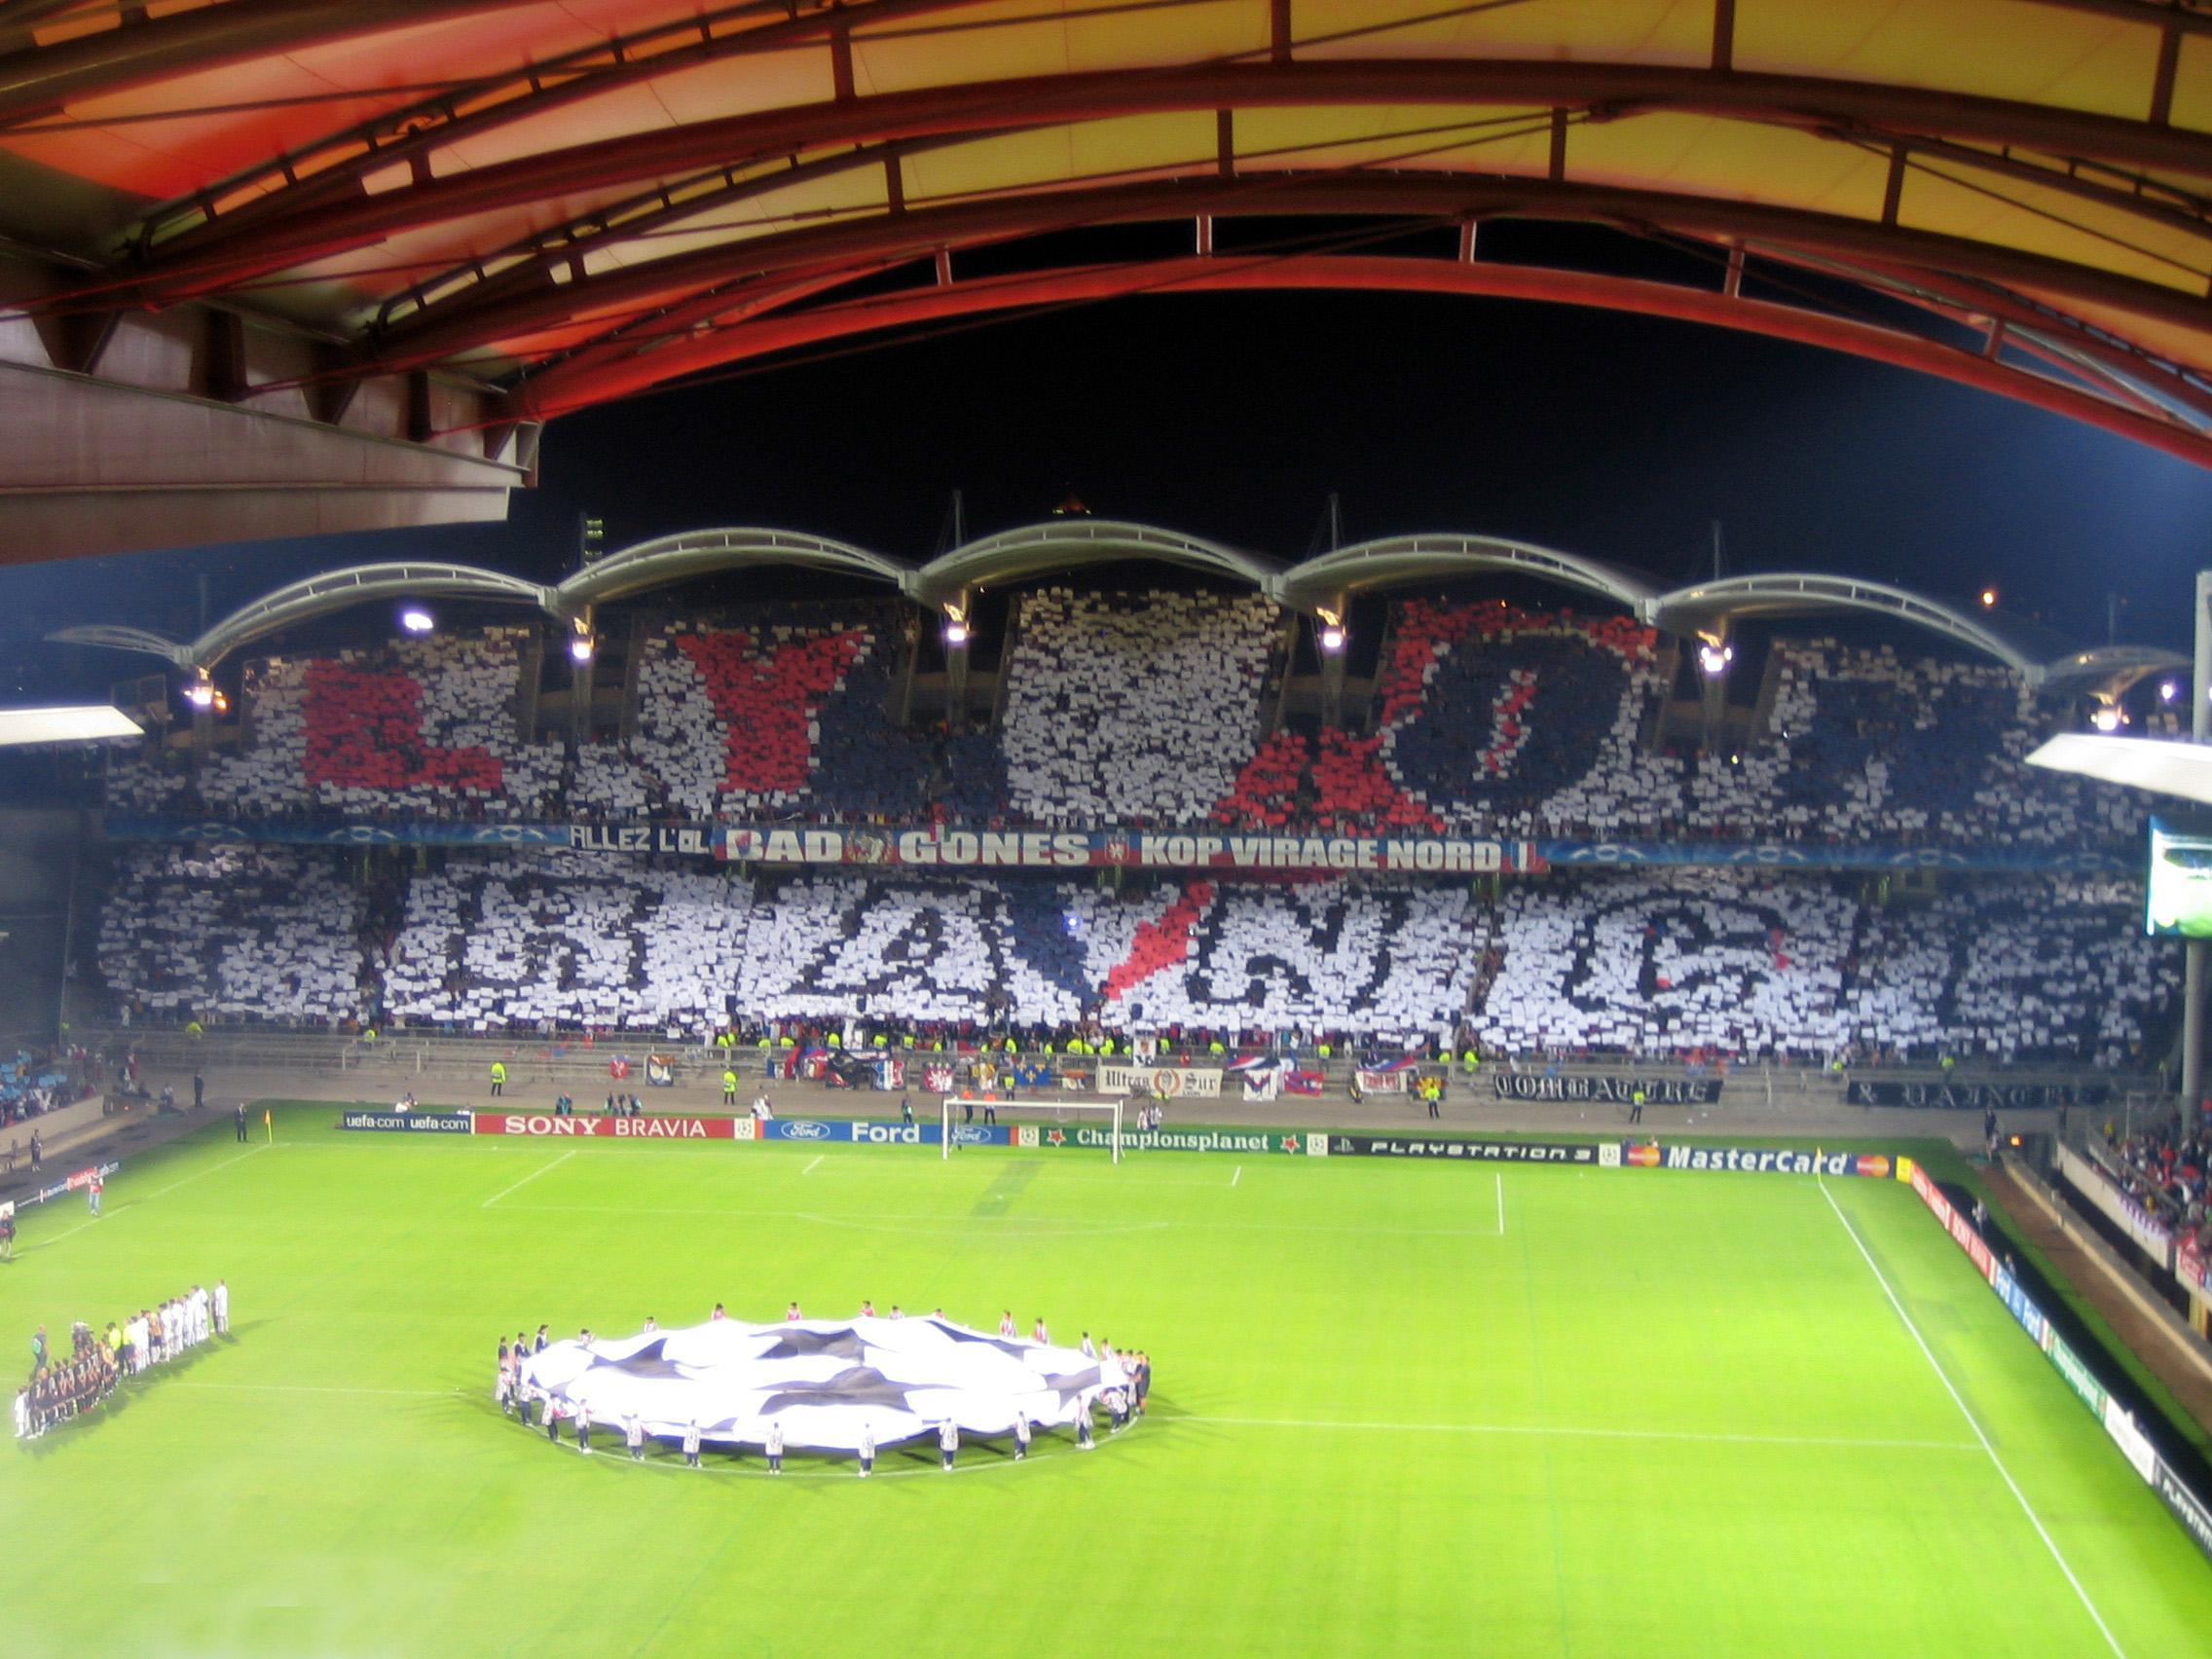 Le stade de Gerland, réception du Real Madrid